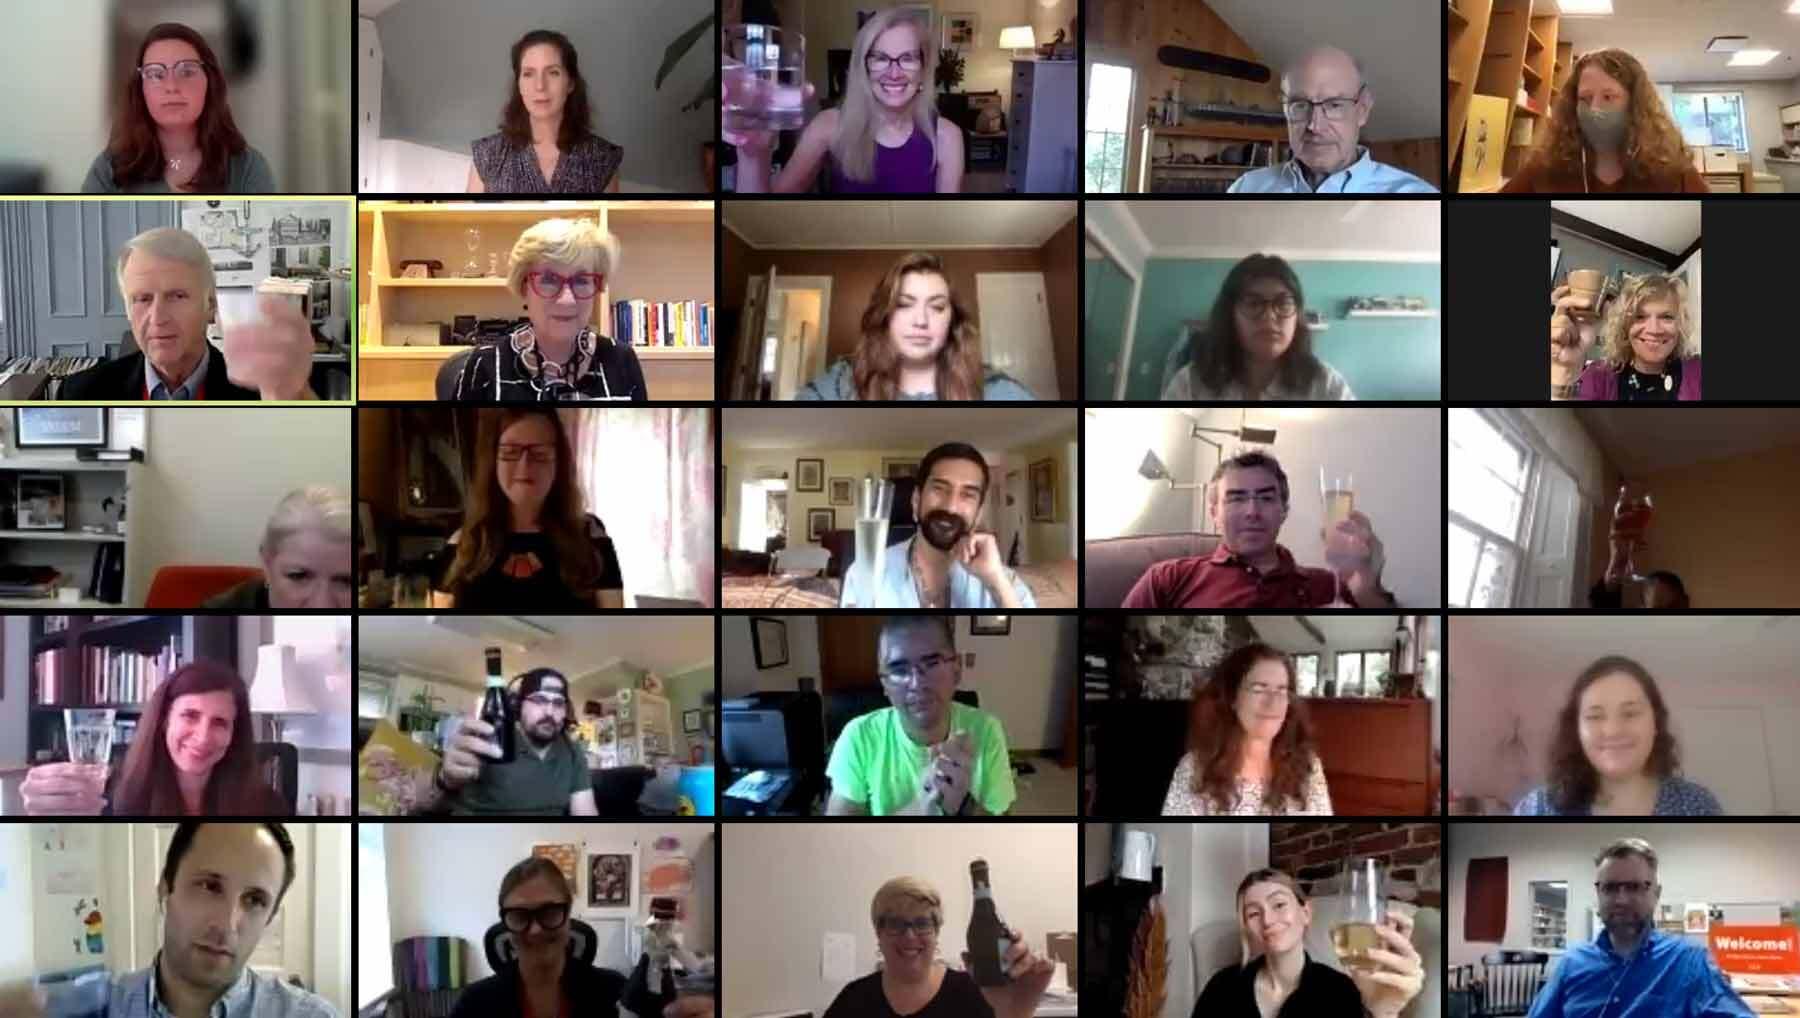 The staff enjoys a virtual welcome for Lynda Hartigan.